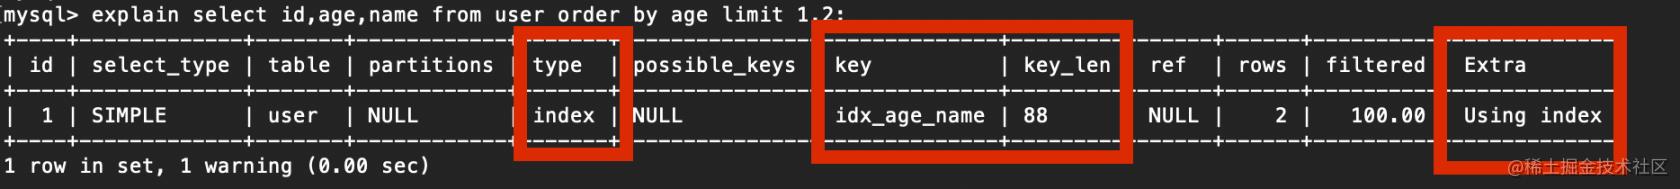 MySQL 的覆盖索引与回表